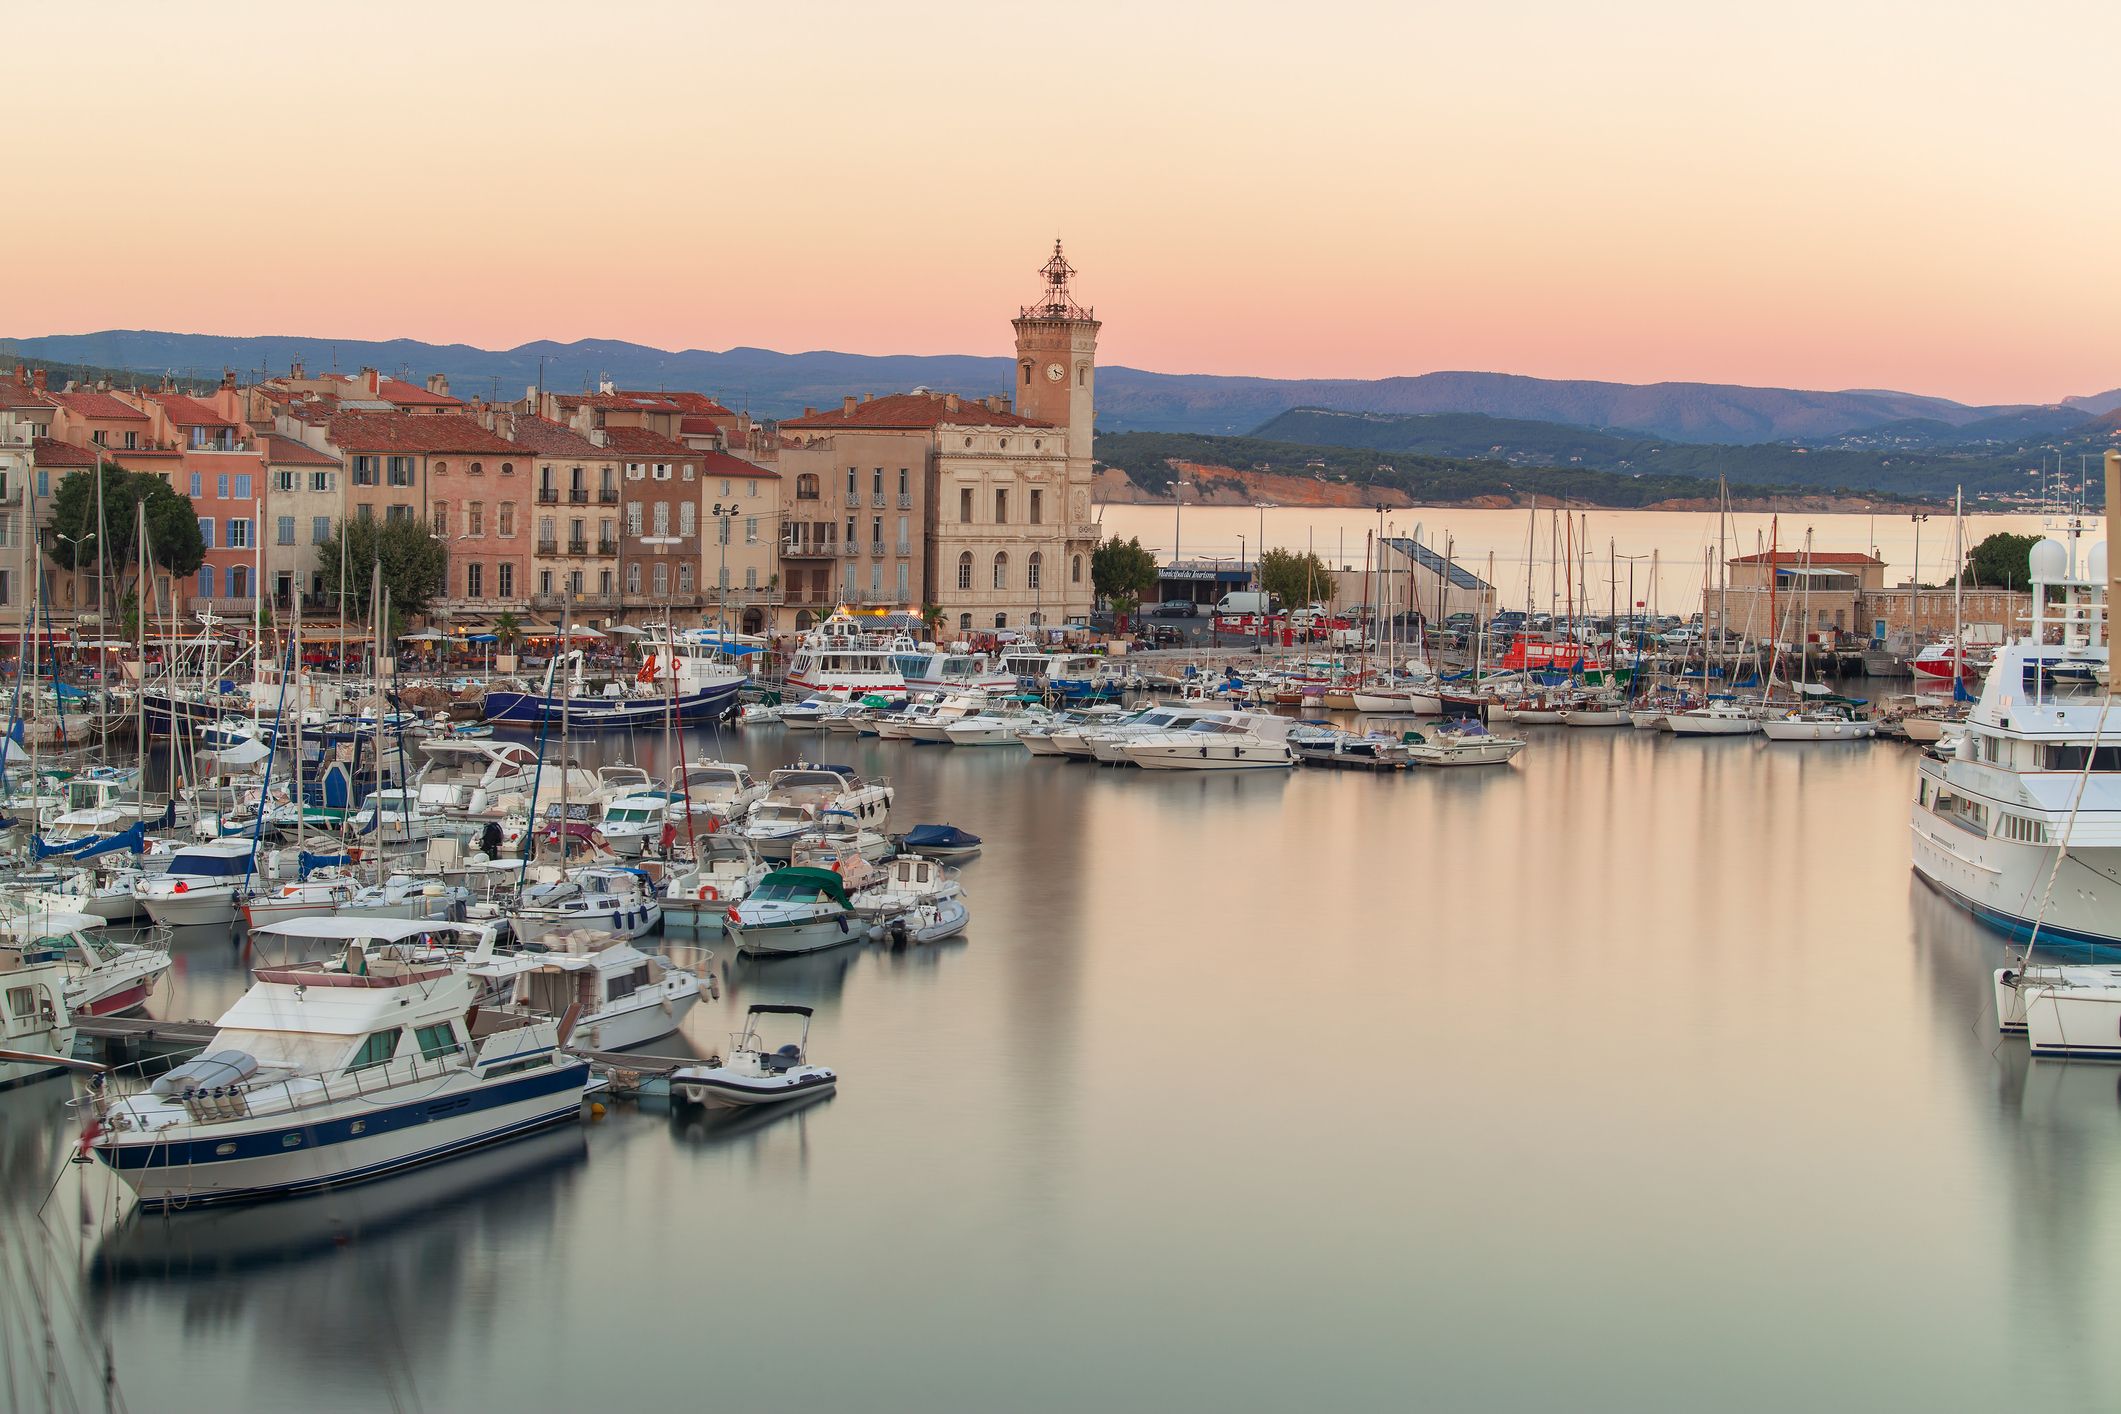 Programme immobilier escale marine la ciotat 42 biens neufs - Restaurant port la ciotat ...